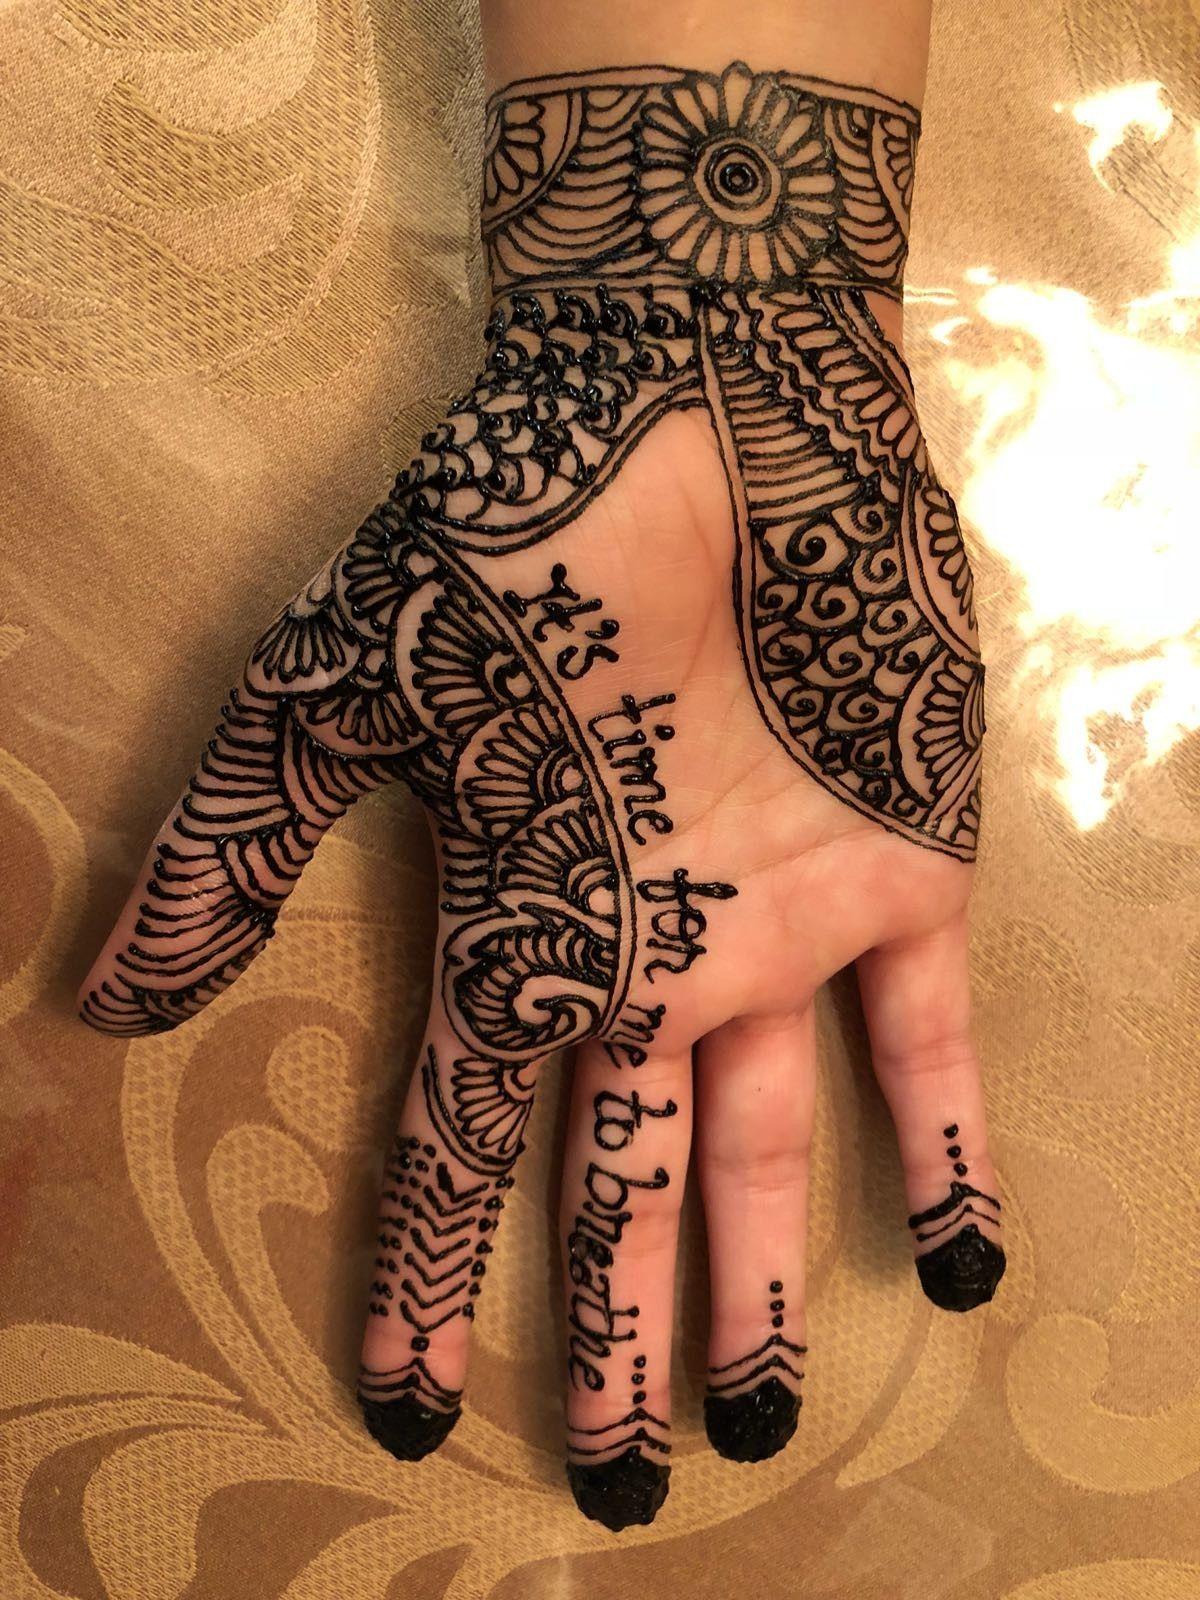 81031d687 Simple henna with lyrics   mehendi   Henna, Hand henna, Simple henna